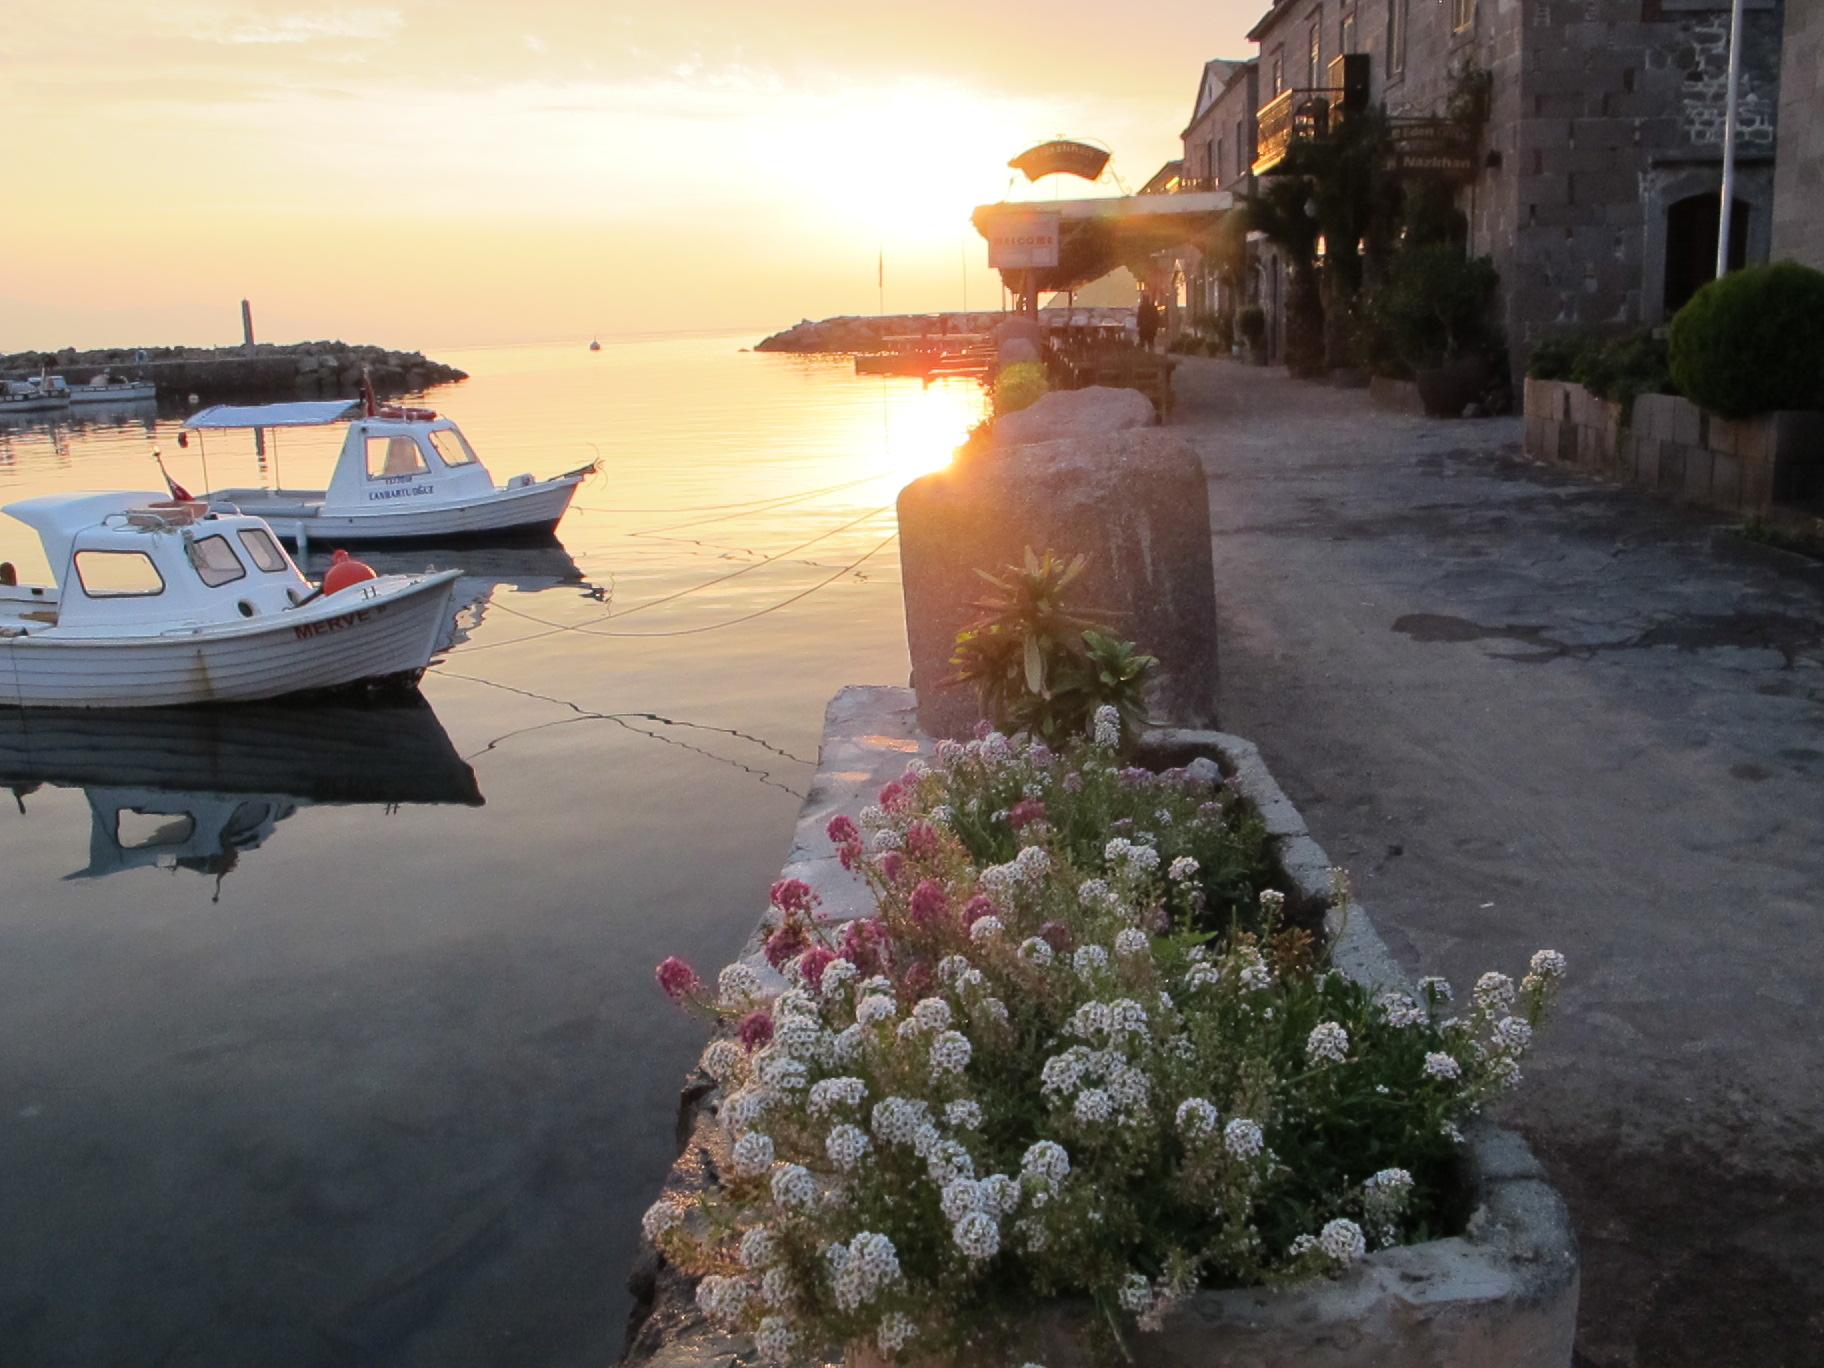 Vid Egeiska havet